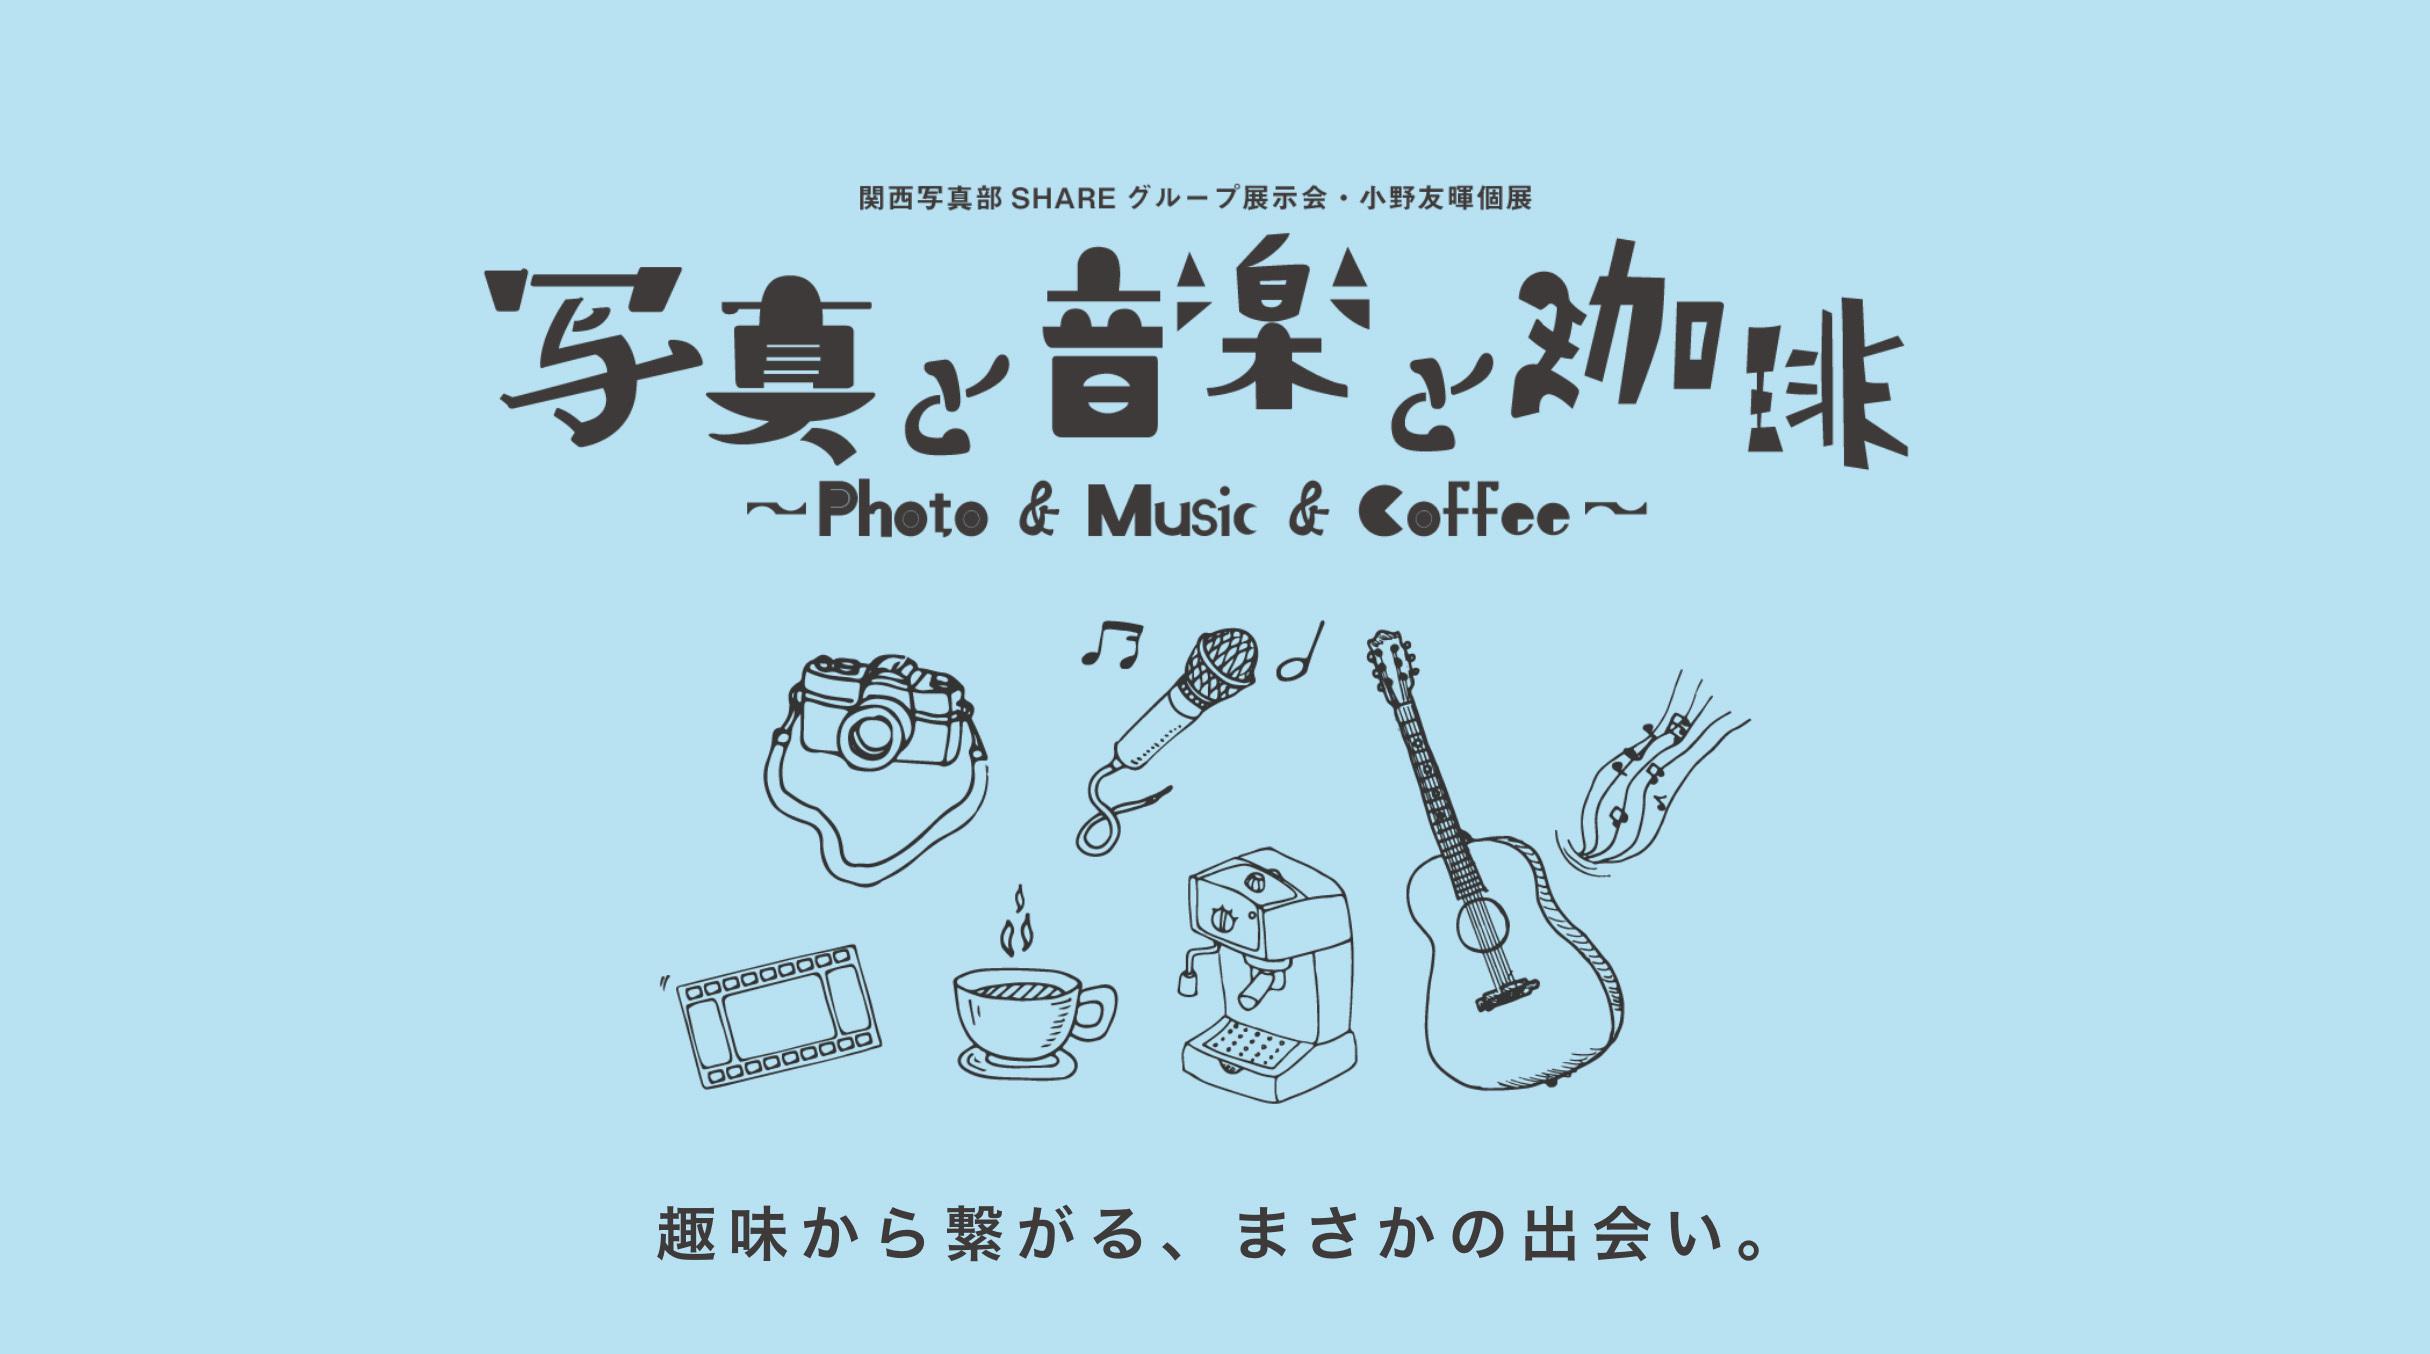 THE STORIES vol.2 「写真と音楽と珈琲 ー 趣味から繋がる、まさかの出会い。」/